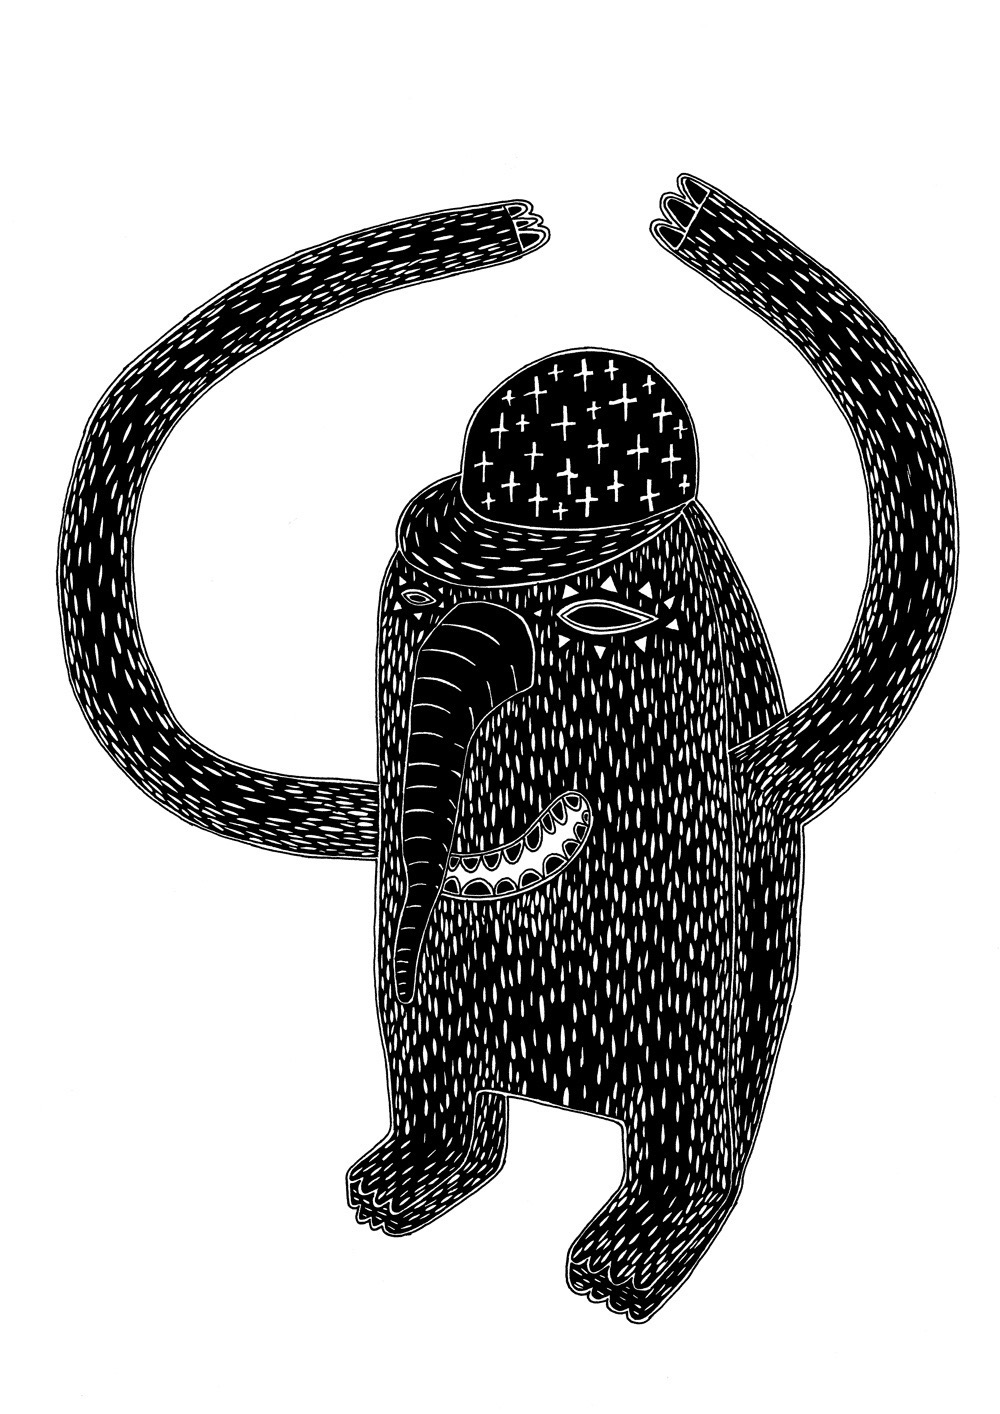 illustration, illustrations, illustrator, illustrators, creature, happy, smile, smiles, teeth, smiling, cap, caps, hat, hats, handsup, lines, texture, cross, crosses